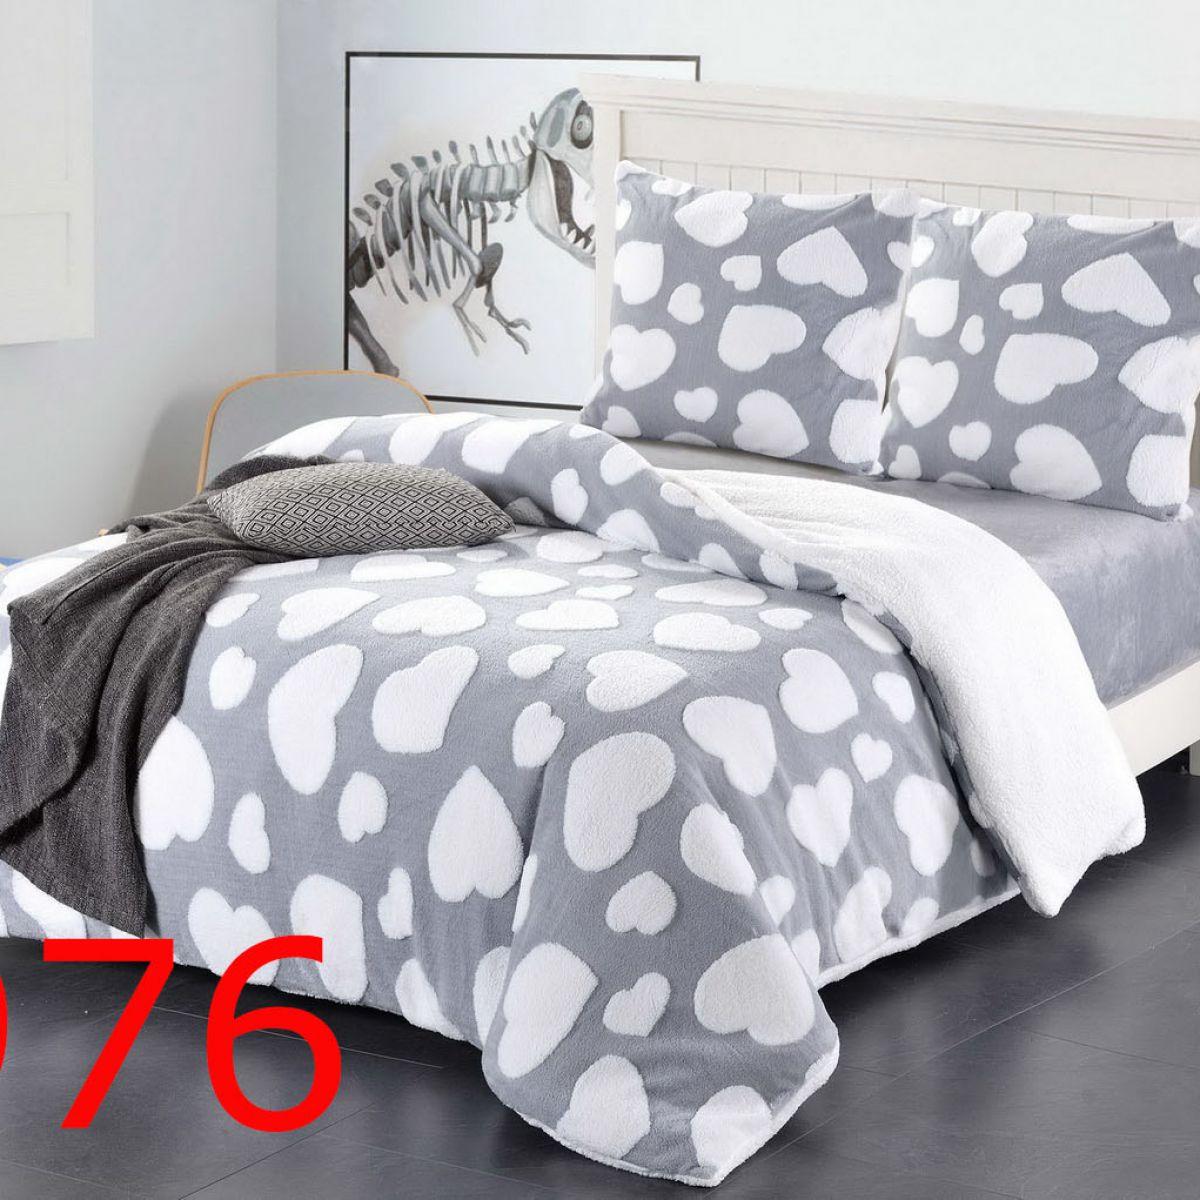 Plush Beddings - Cotton World - SHK-5201 - 220x200 cm - 3 pcs